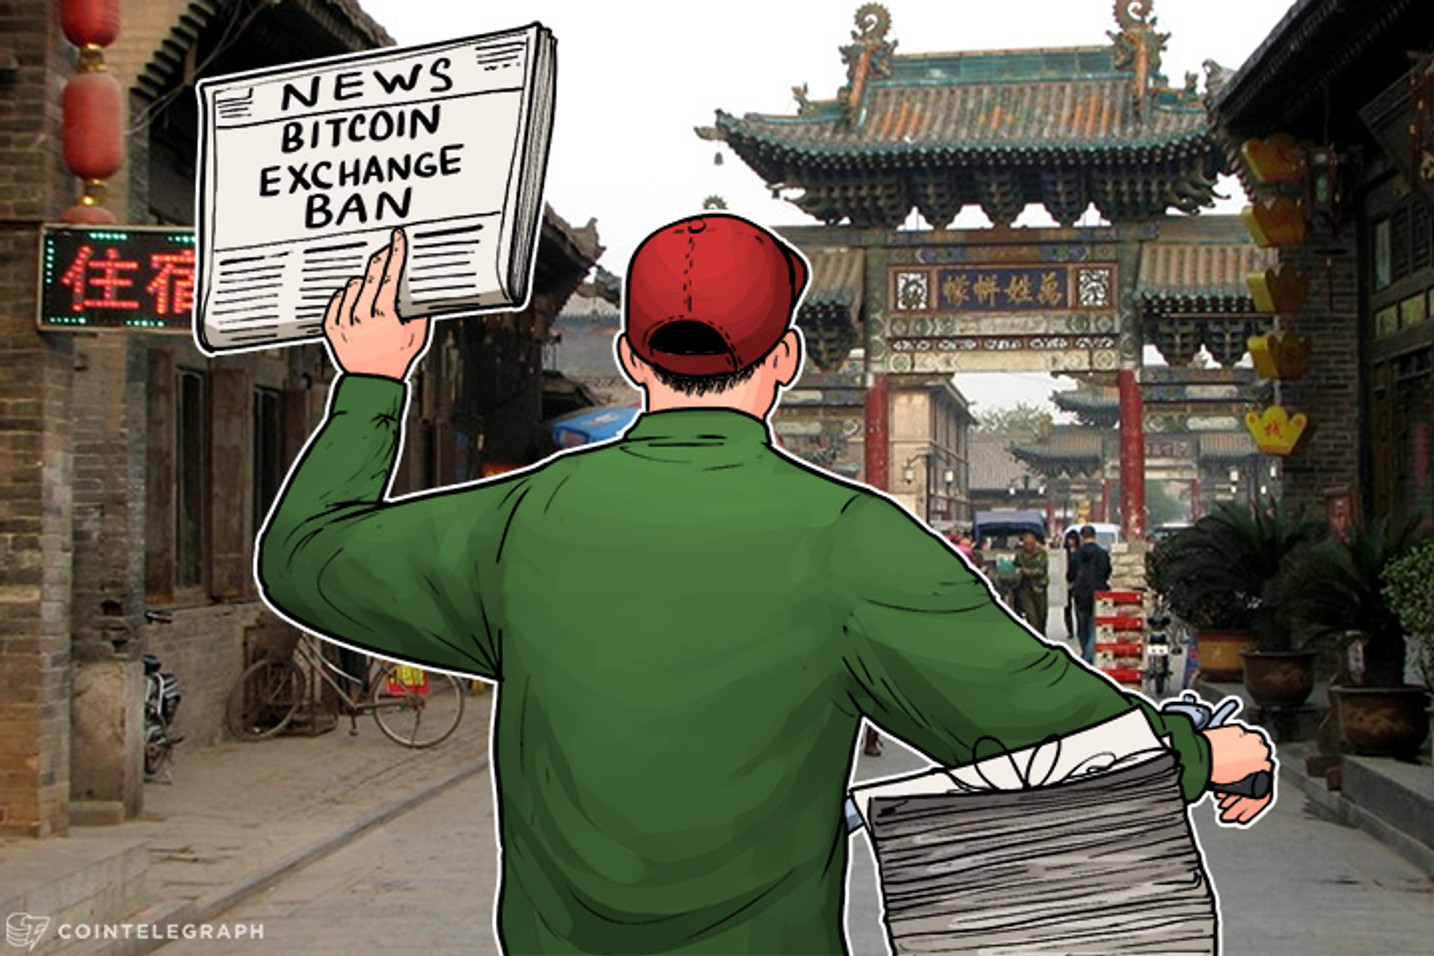 ¿China está prohibiendo realmente el Bitcoin, o son noticias falsas?